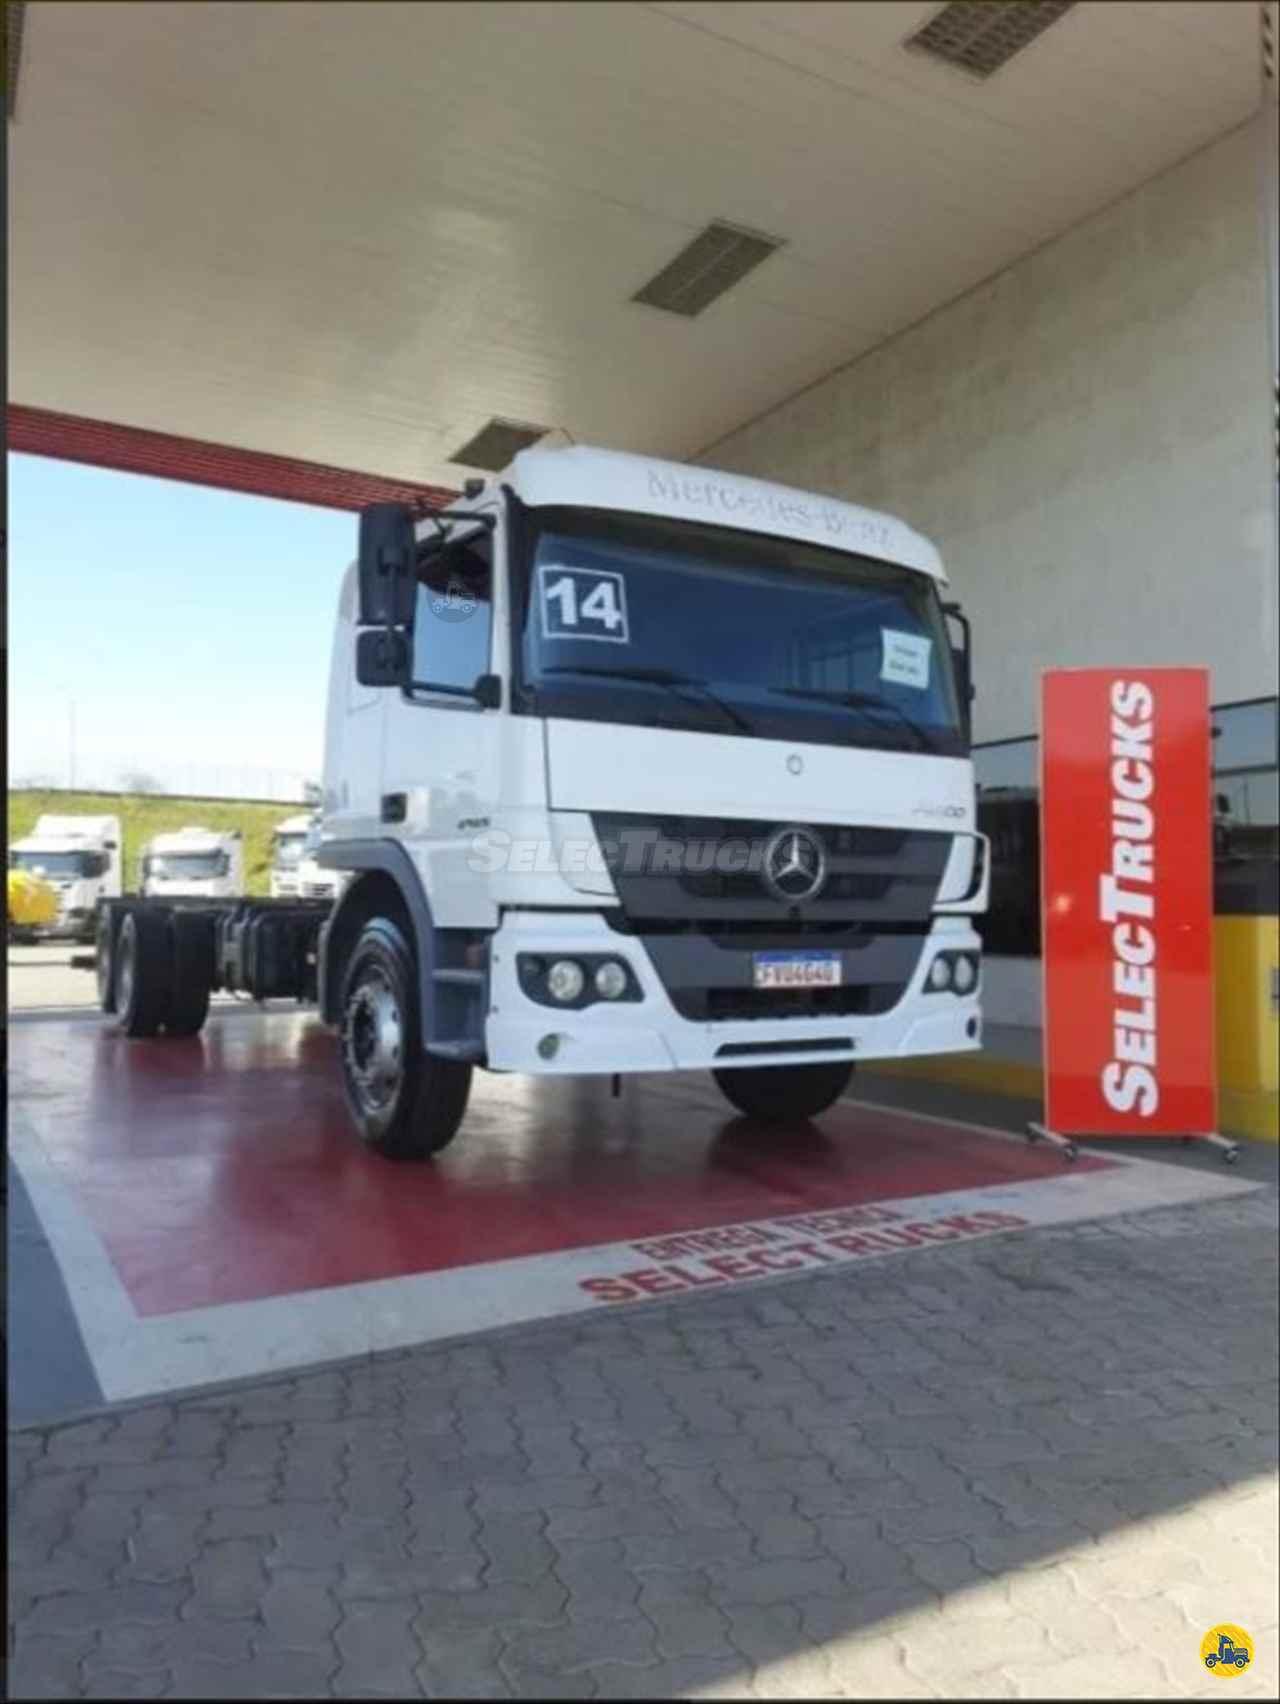 CAMINHAO MERCEDES-BENZ MB 2425 Chassis Truck 6x2 SelecTrucks - Mauá SP - Matriz  MAUA SÃO PAULO SP